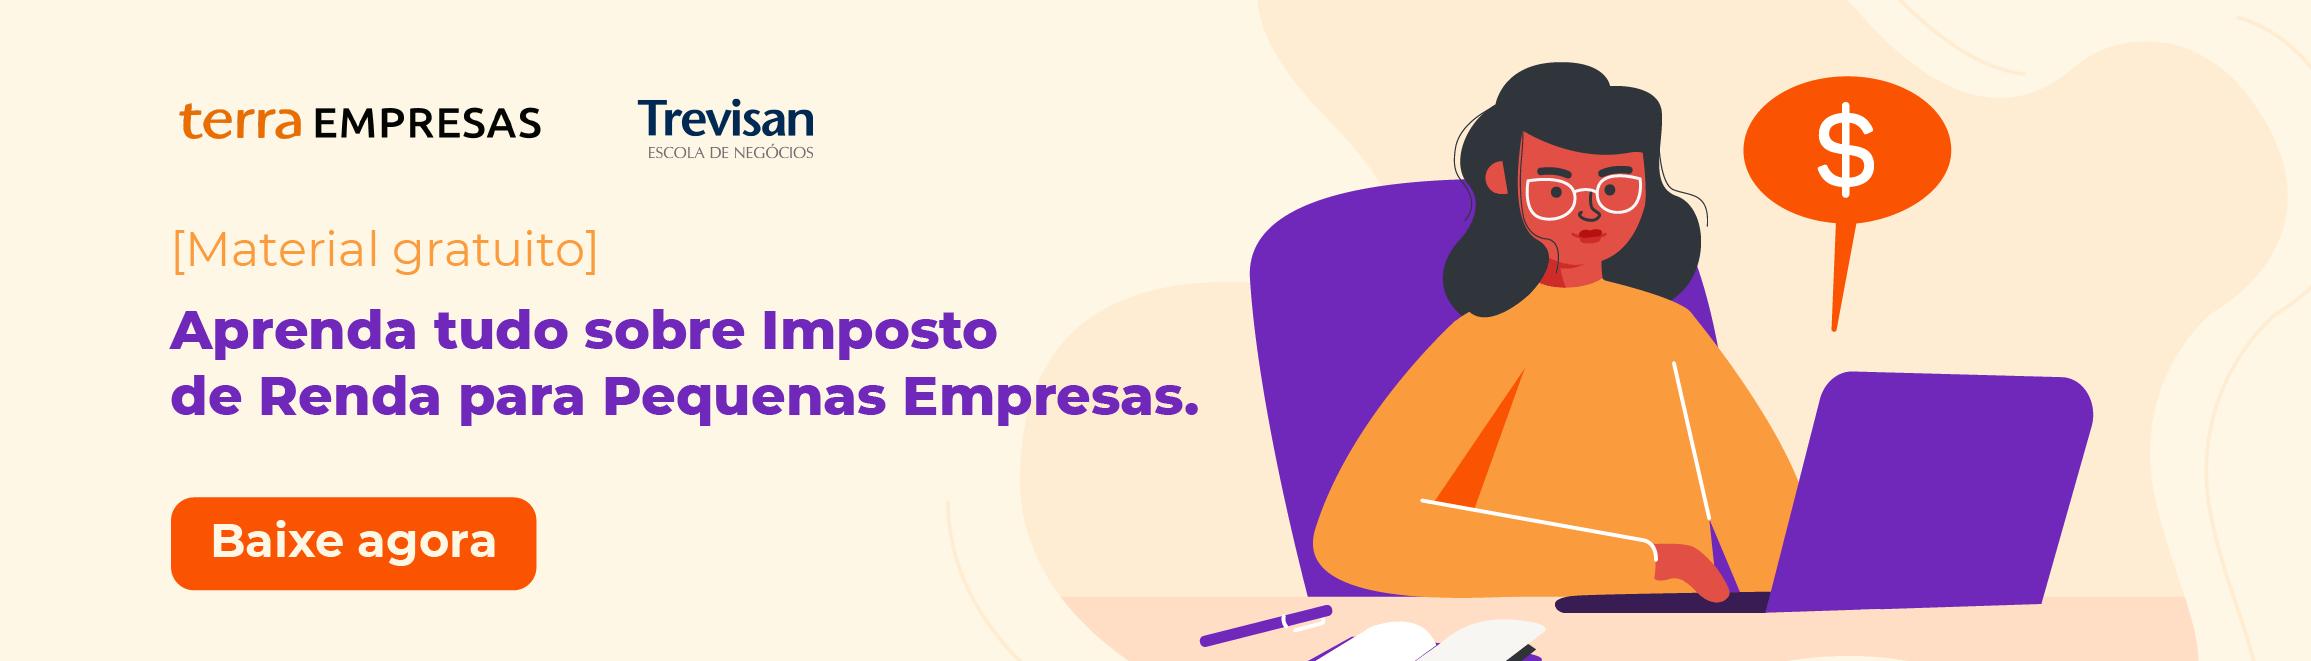 04110-Terra- Whitepaper pós Webinar Trevisan- Peças- CTA